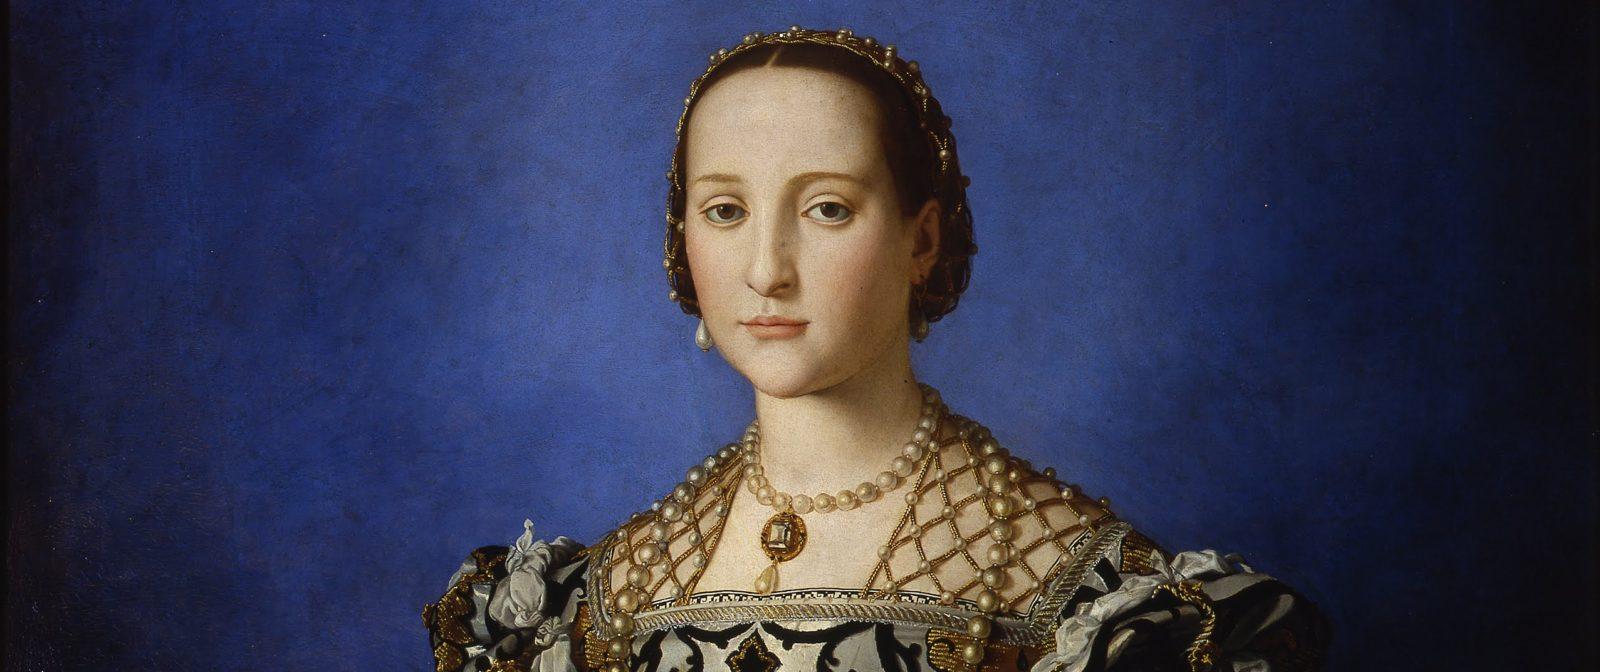 Agnolo Bronzino, Eleonora di Toledo and her son, c. 1545, Uffizi, Florence - Bronzino and his women